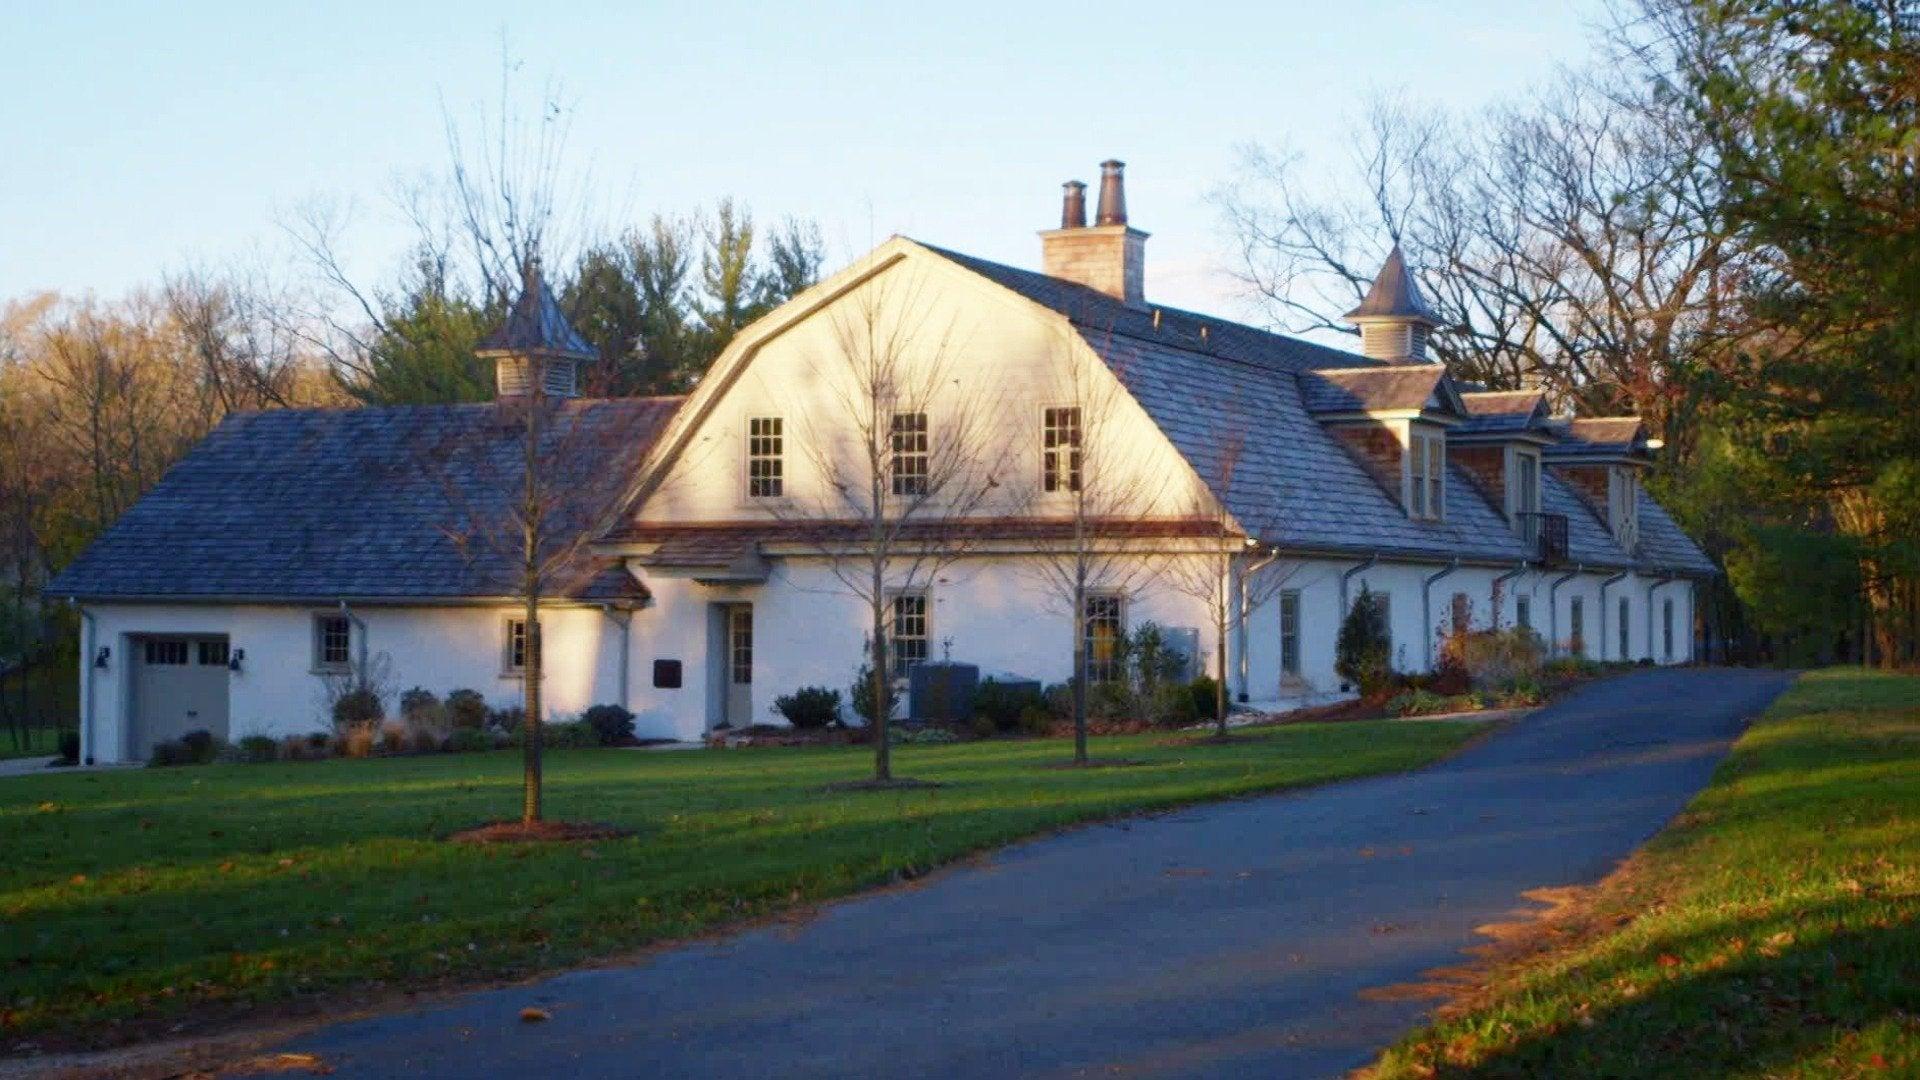 Barn Sweet Home: 1860s Barn Lake Home